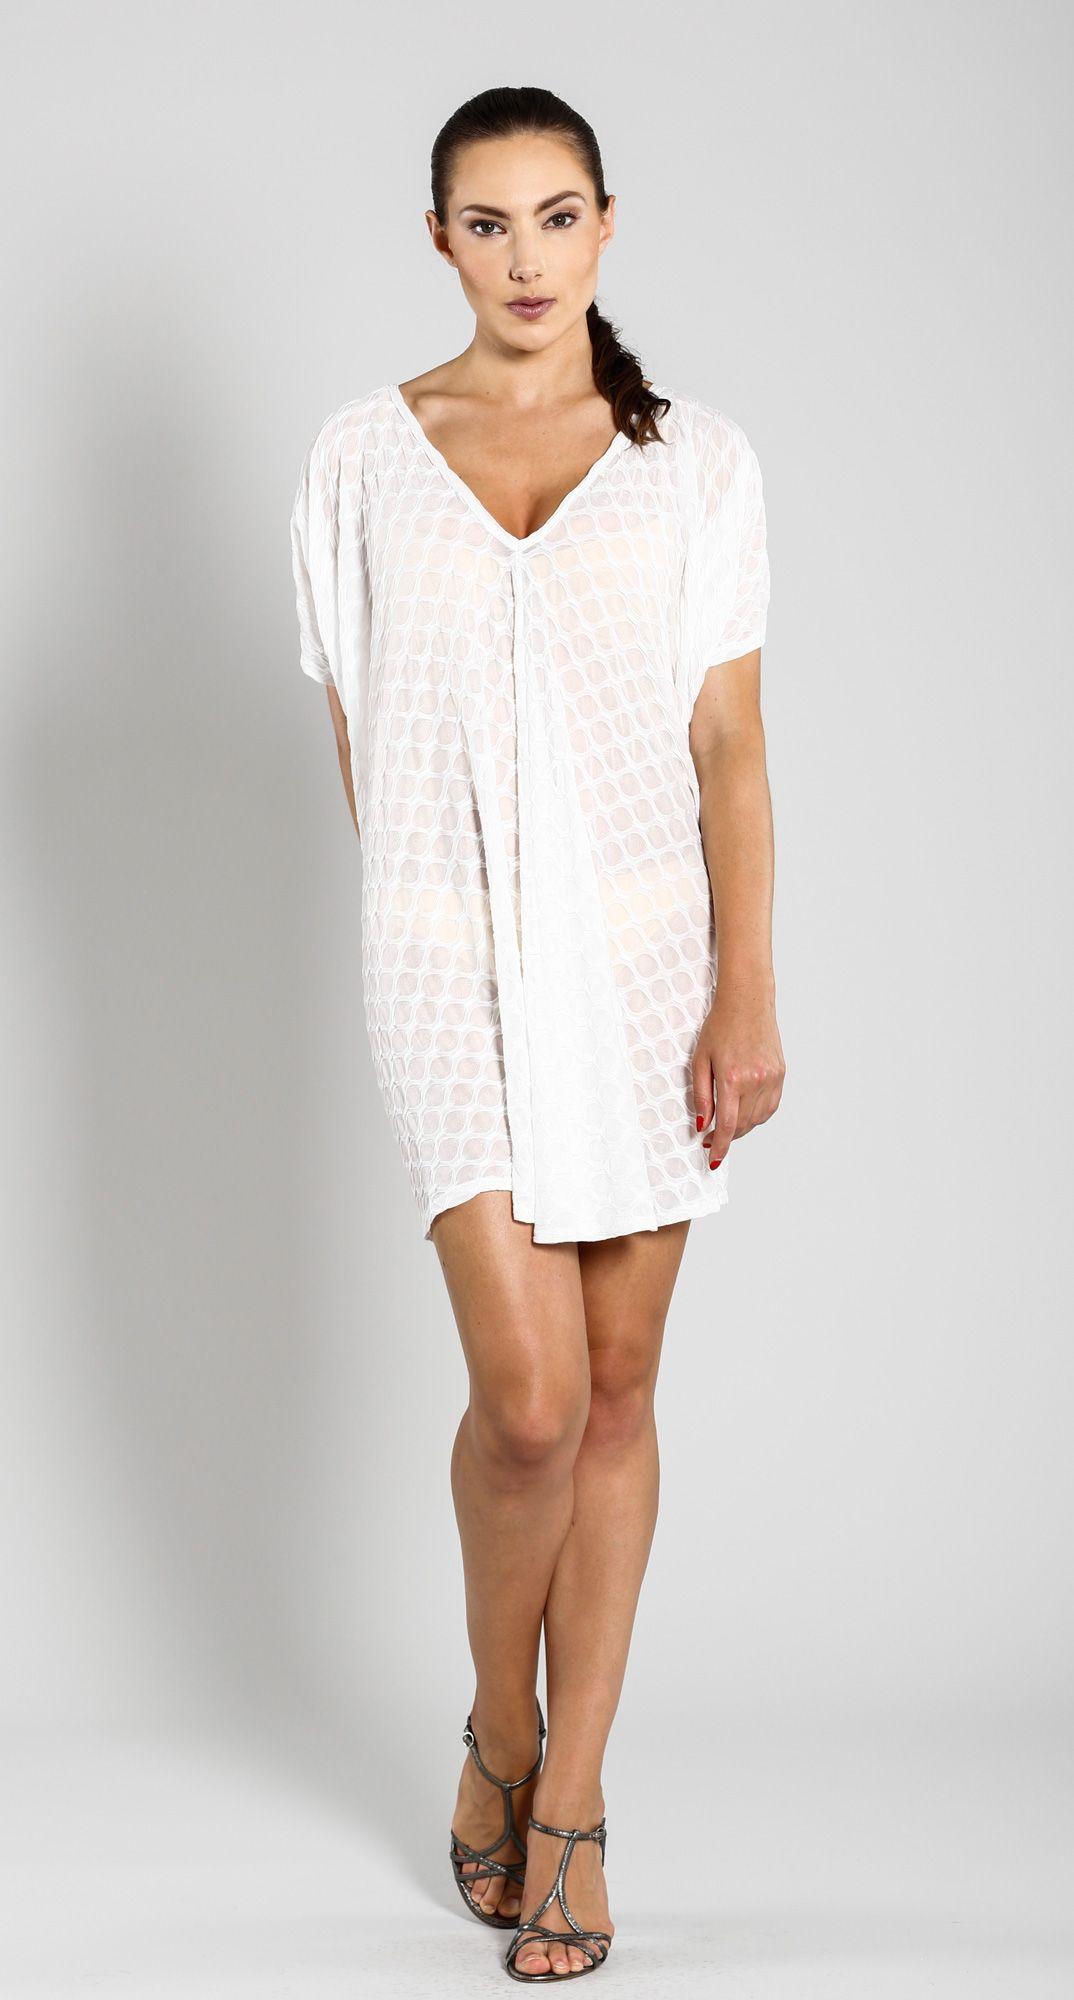 01e5c74fac2f  JordanTaylor  beach  beachwear  resort  resortwear  fashion  style  coverup   pool  dress